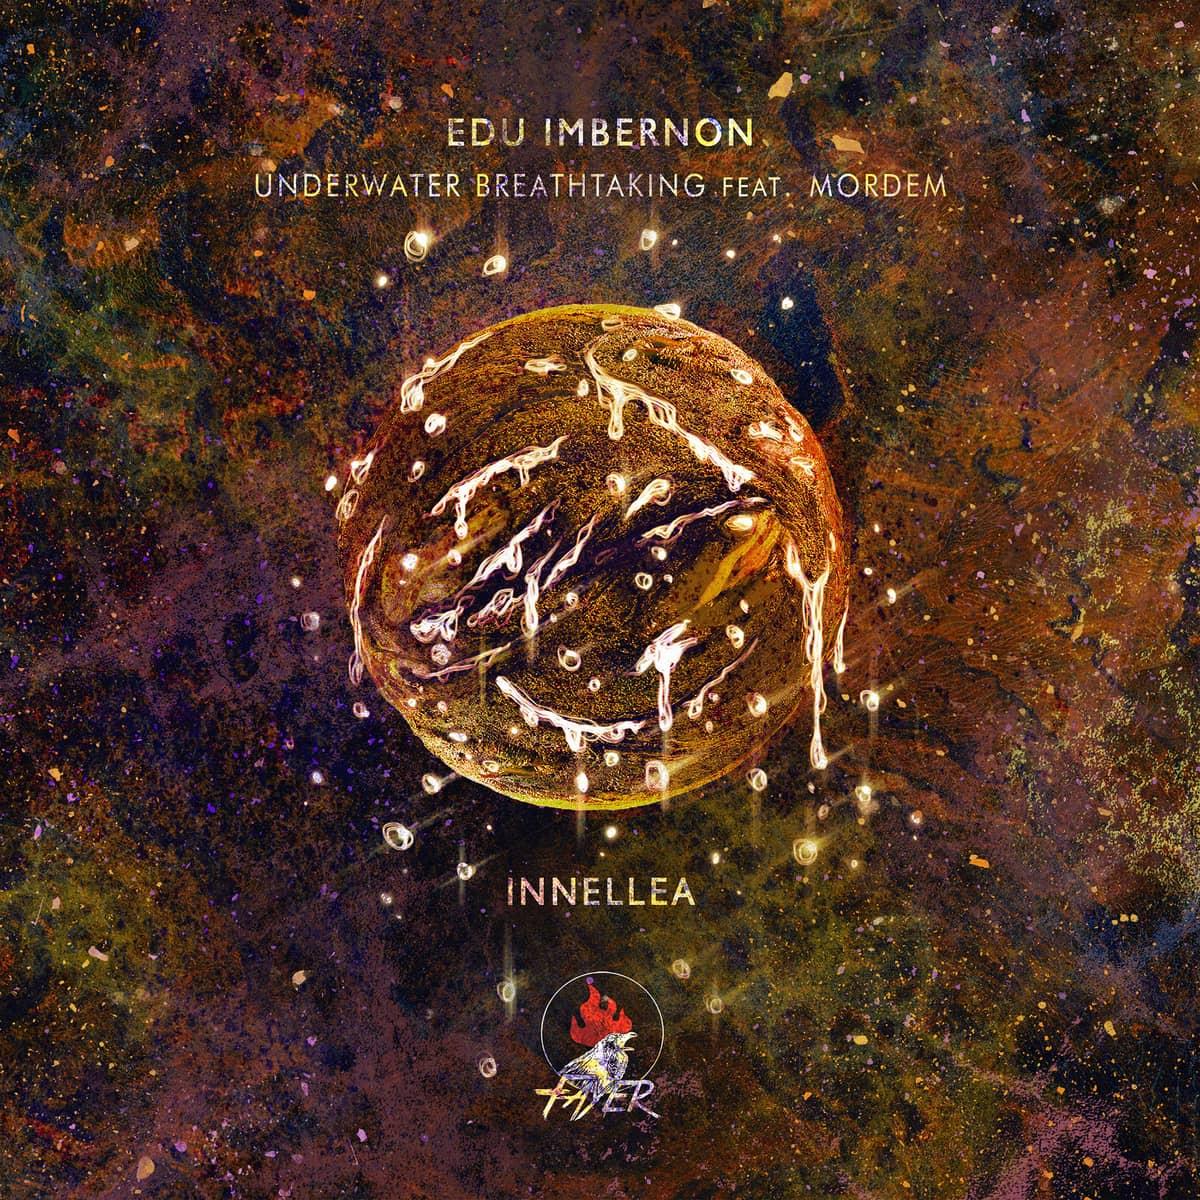 Edu Imbernon feat. Mordem Underwater Breathtaking Innellea remix